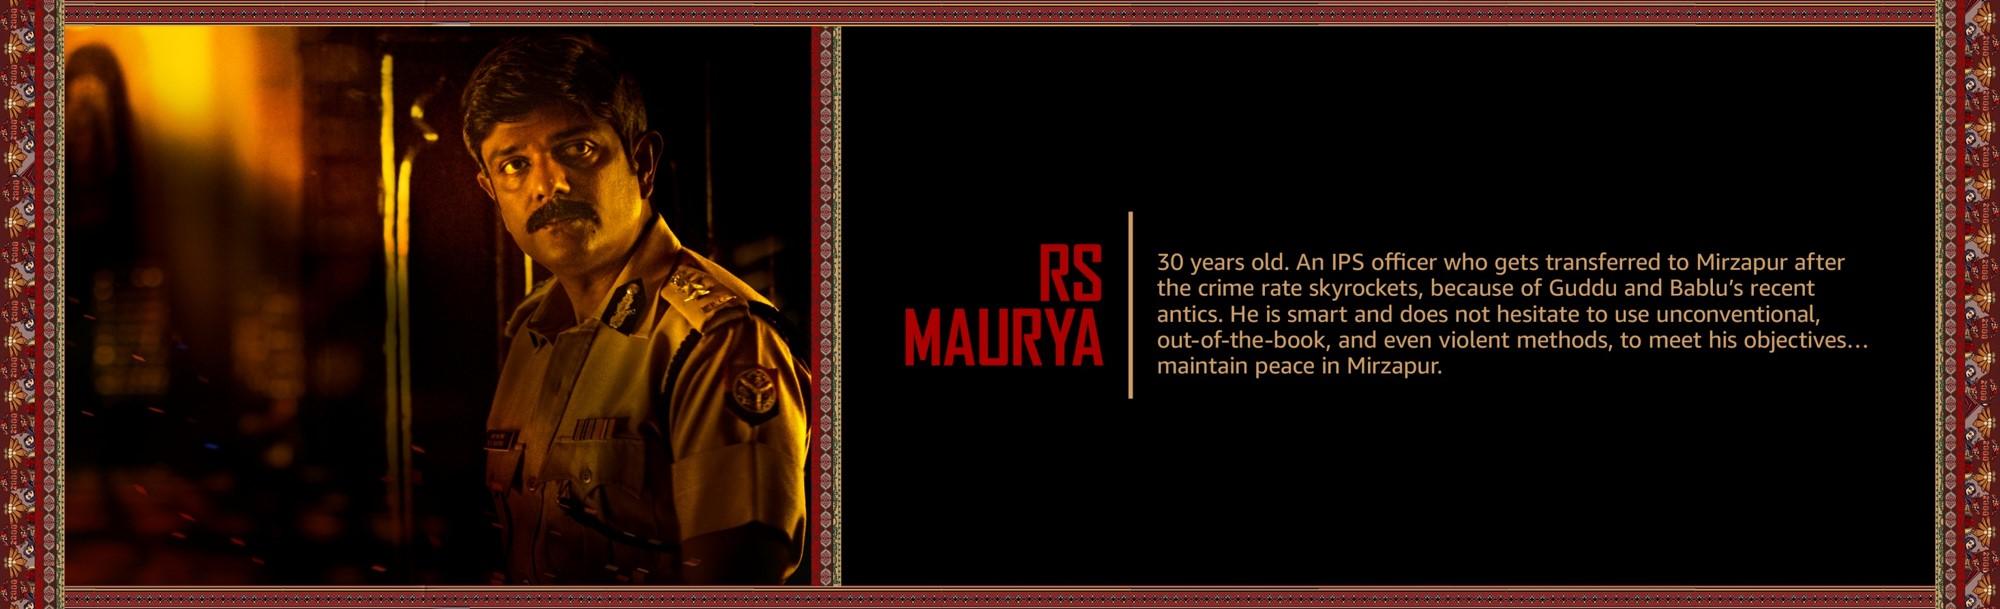 RS Maurya